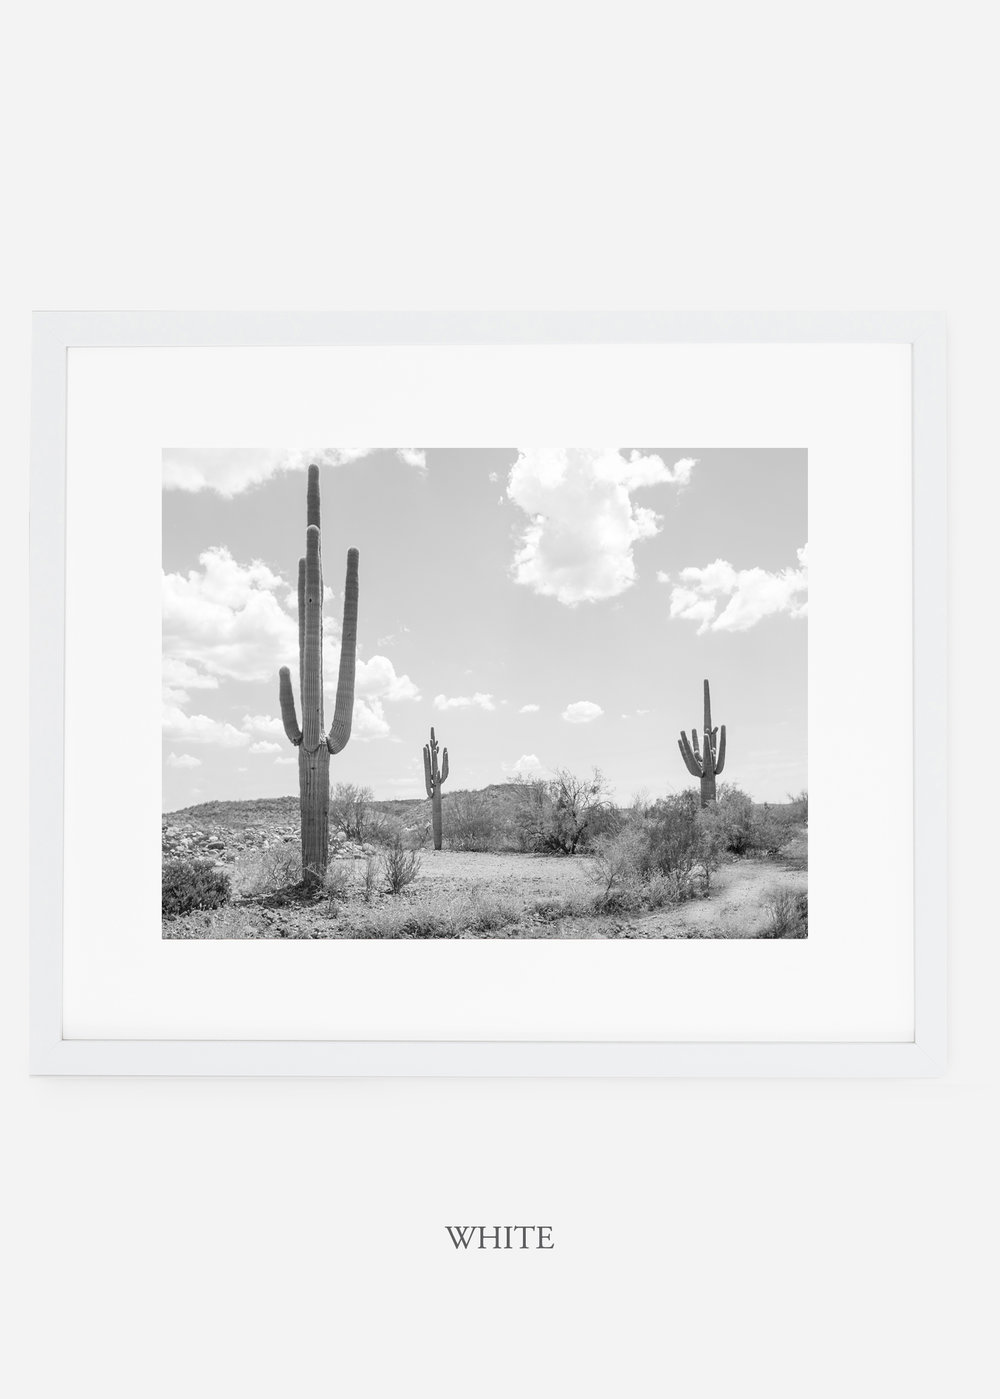 wildercalifornia_whiteframe_threesaguaro_cactus_art_interiordesign.jpg